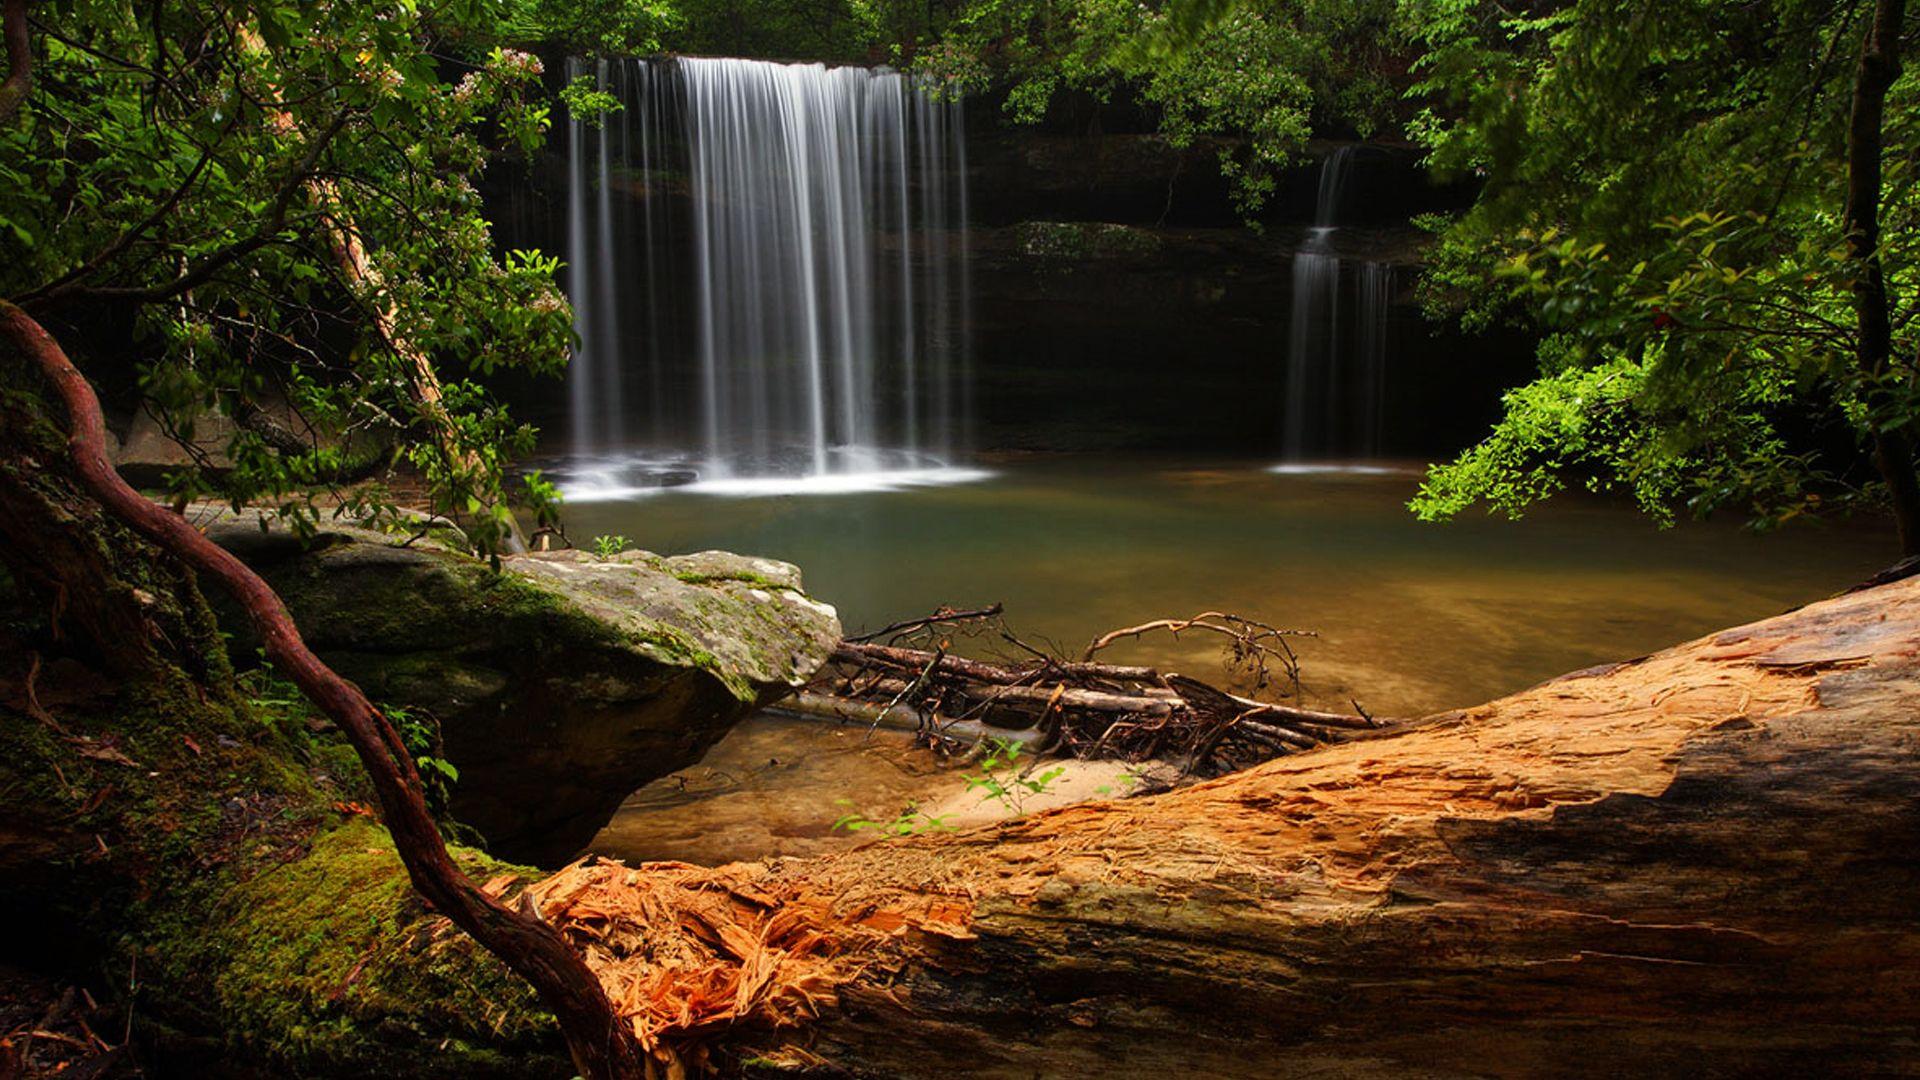 caney creek falls, Alabama Stunning wallpapers, Cool